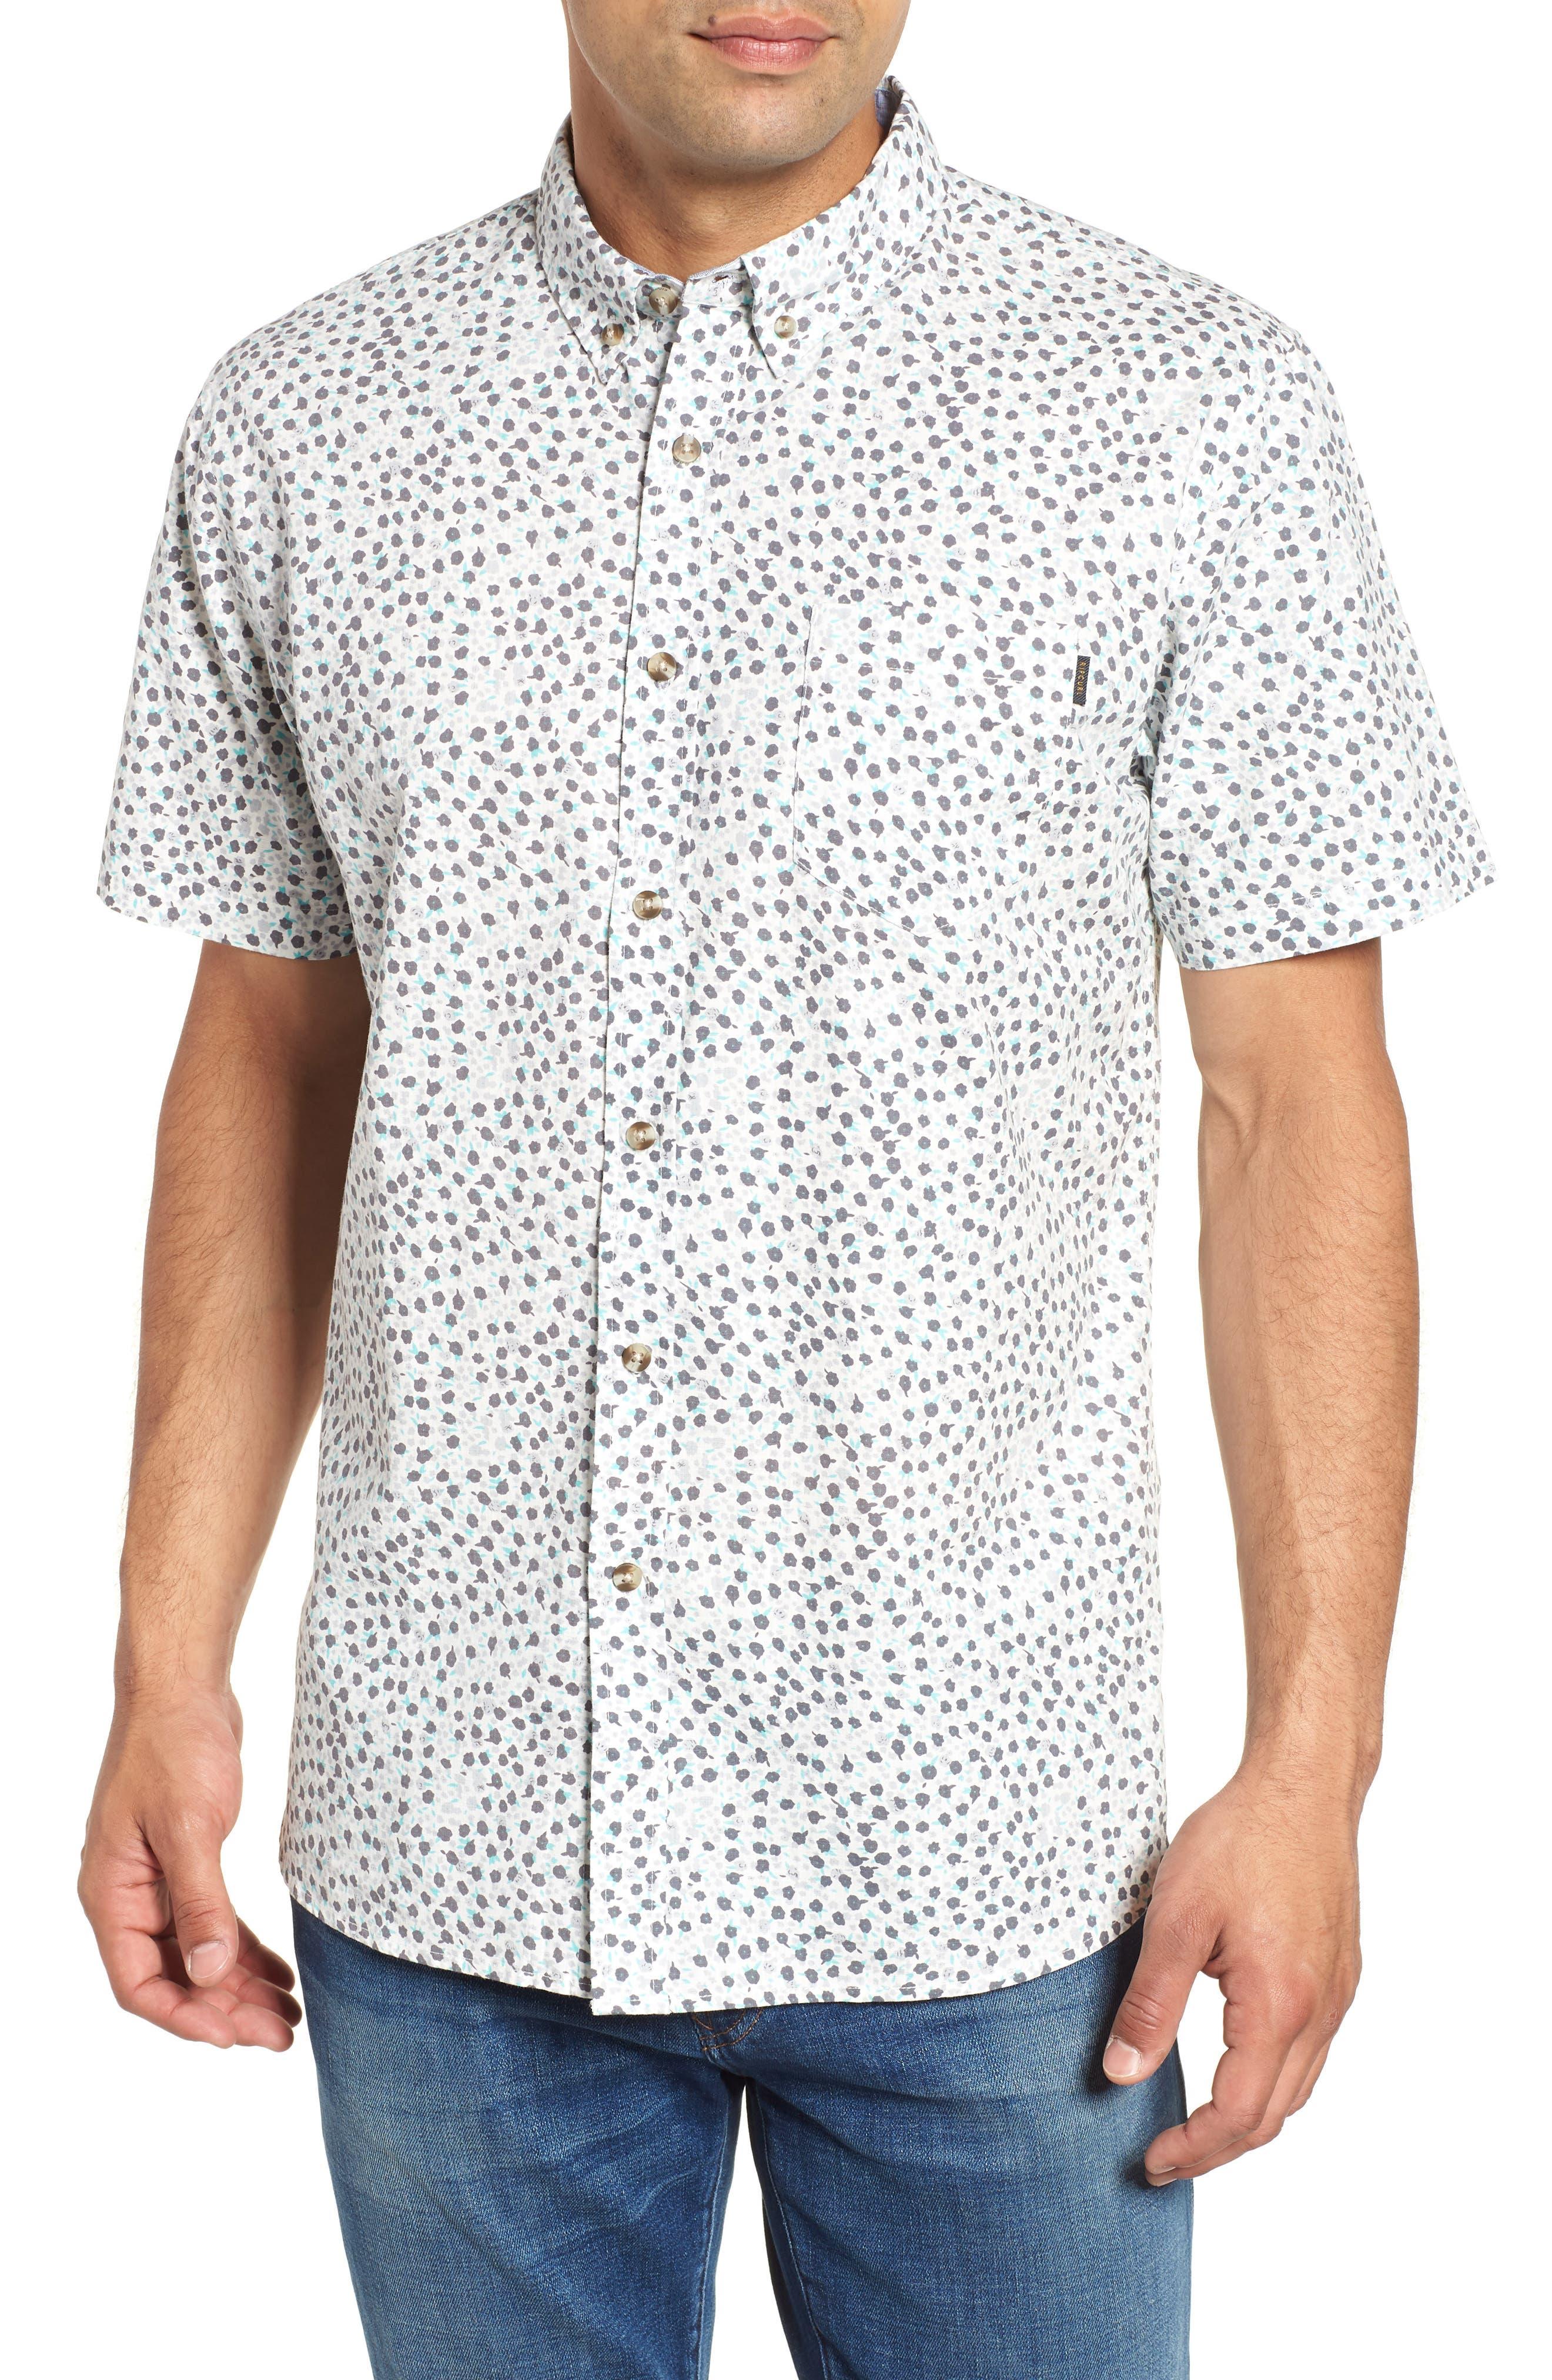 El Mirador Woven Shirt,                             Main thumbnail 1, color,                             Off White